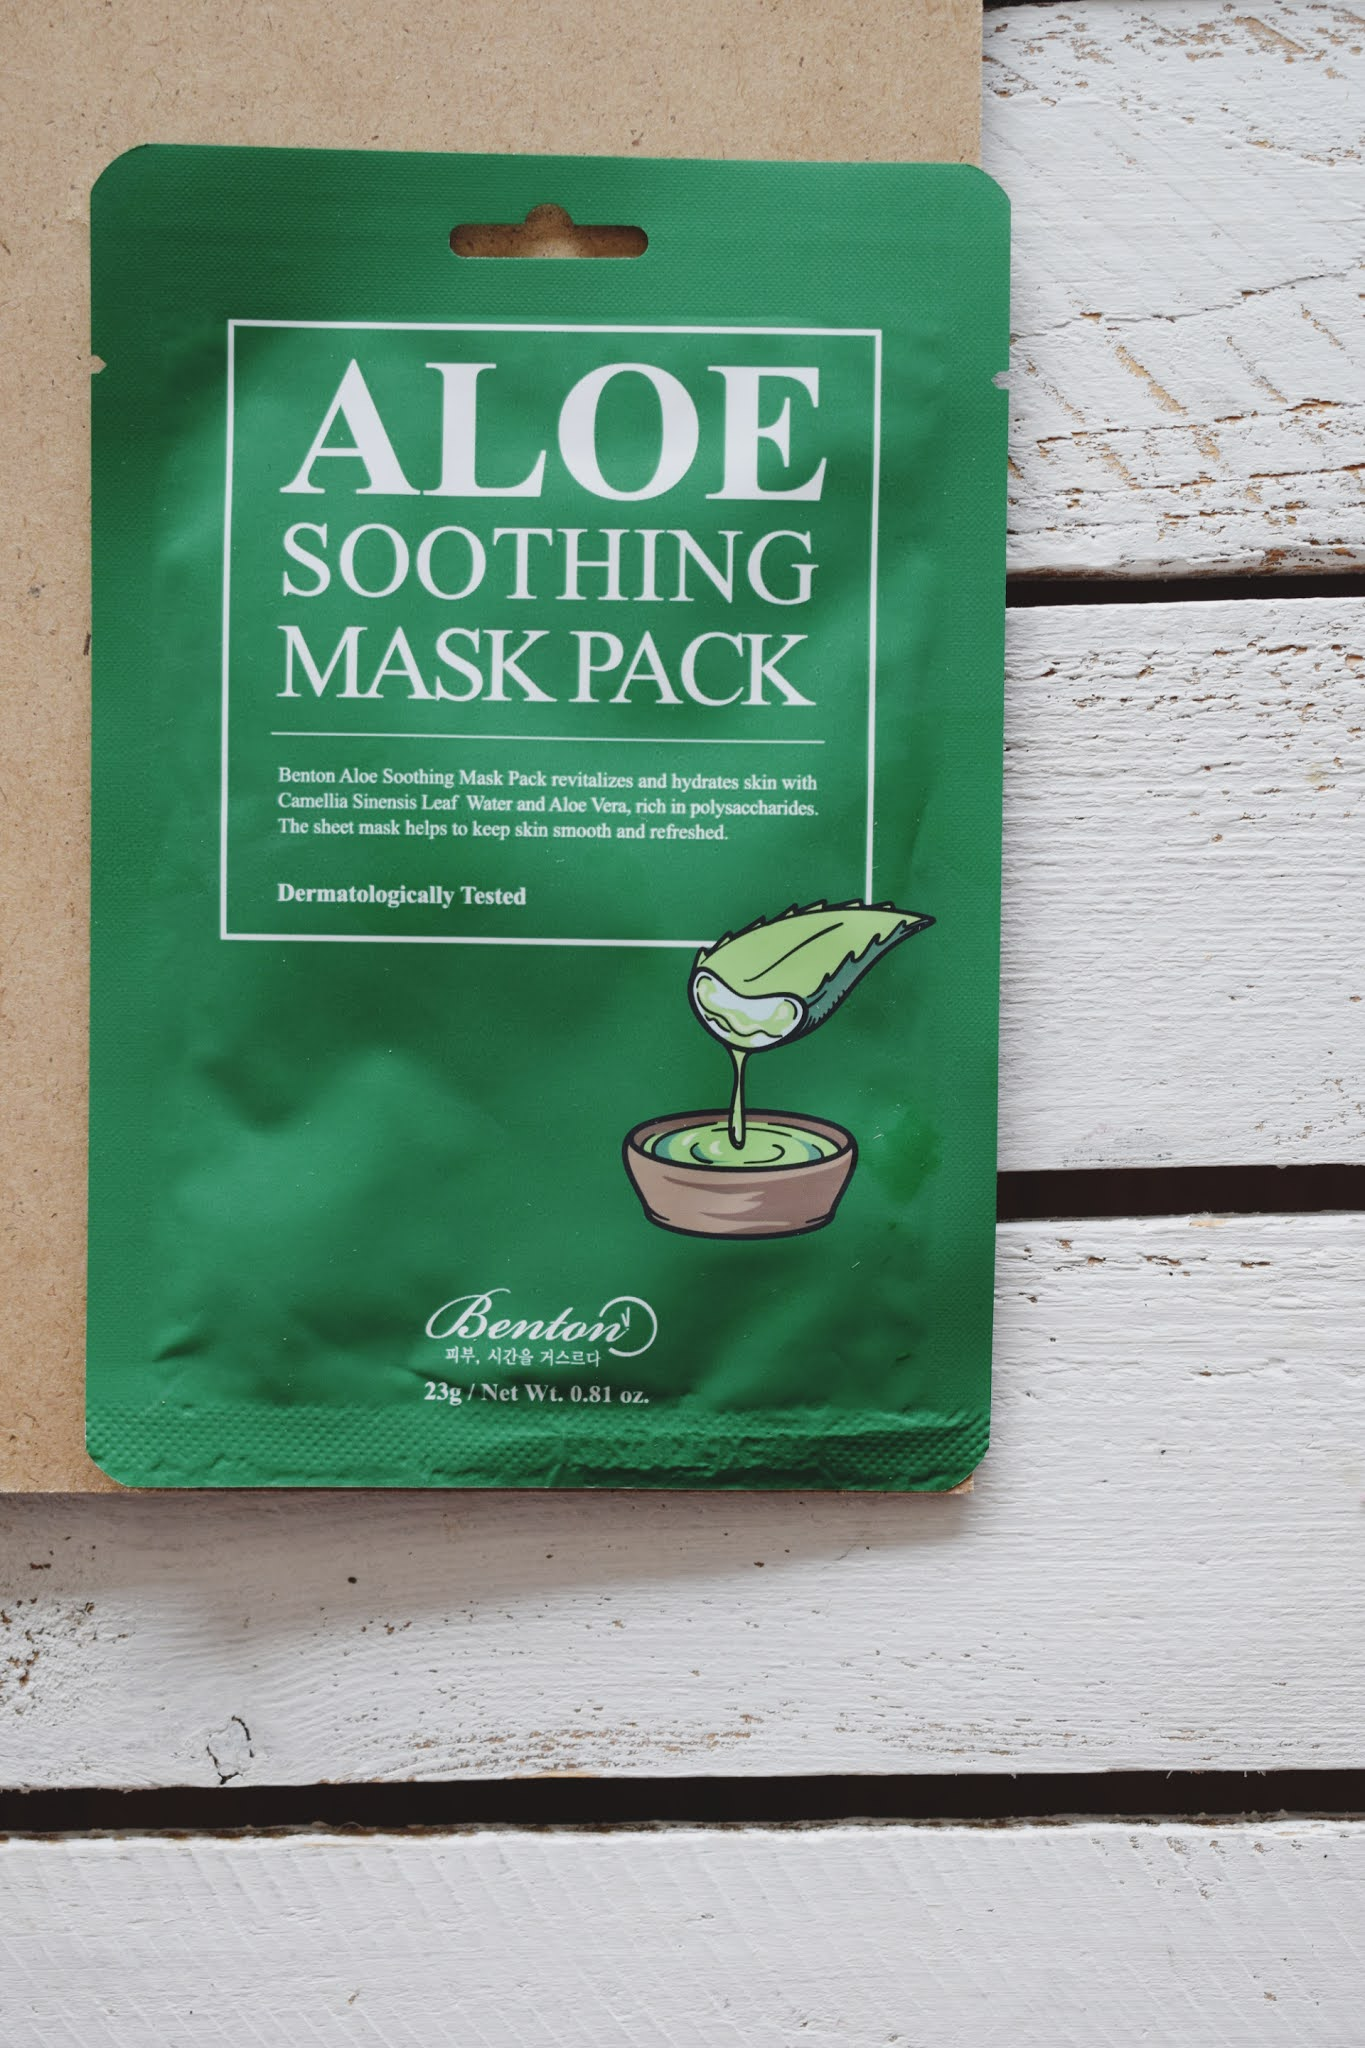 benton, aloe soothing mask pack